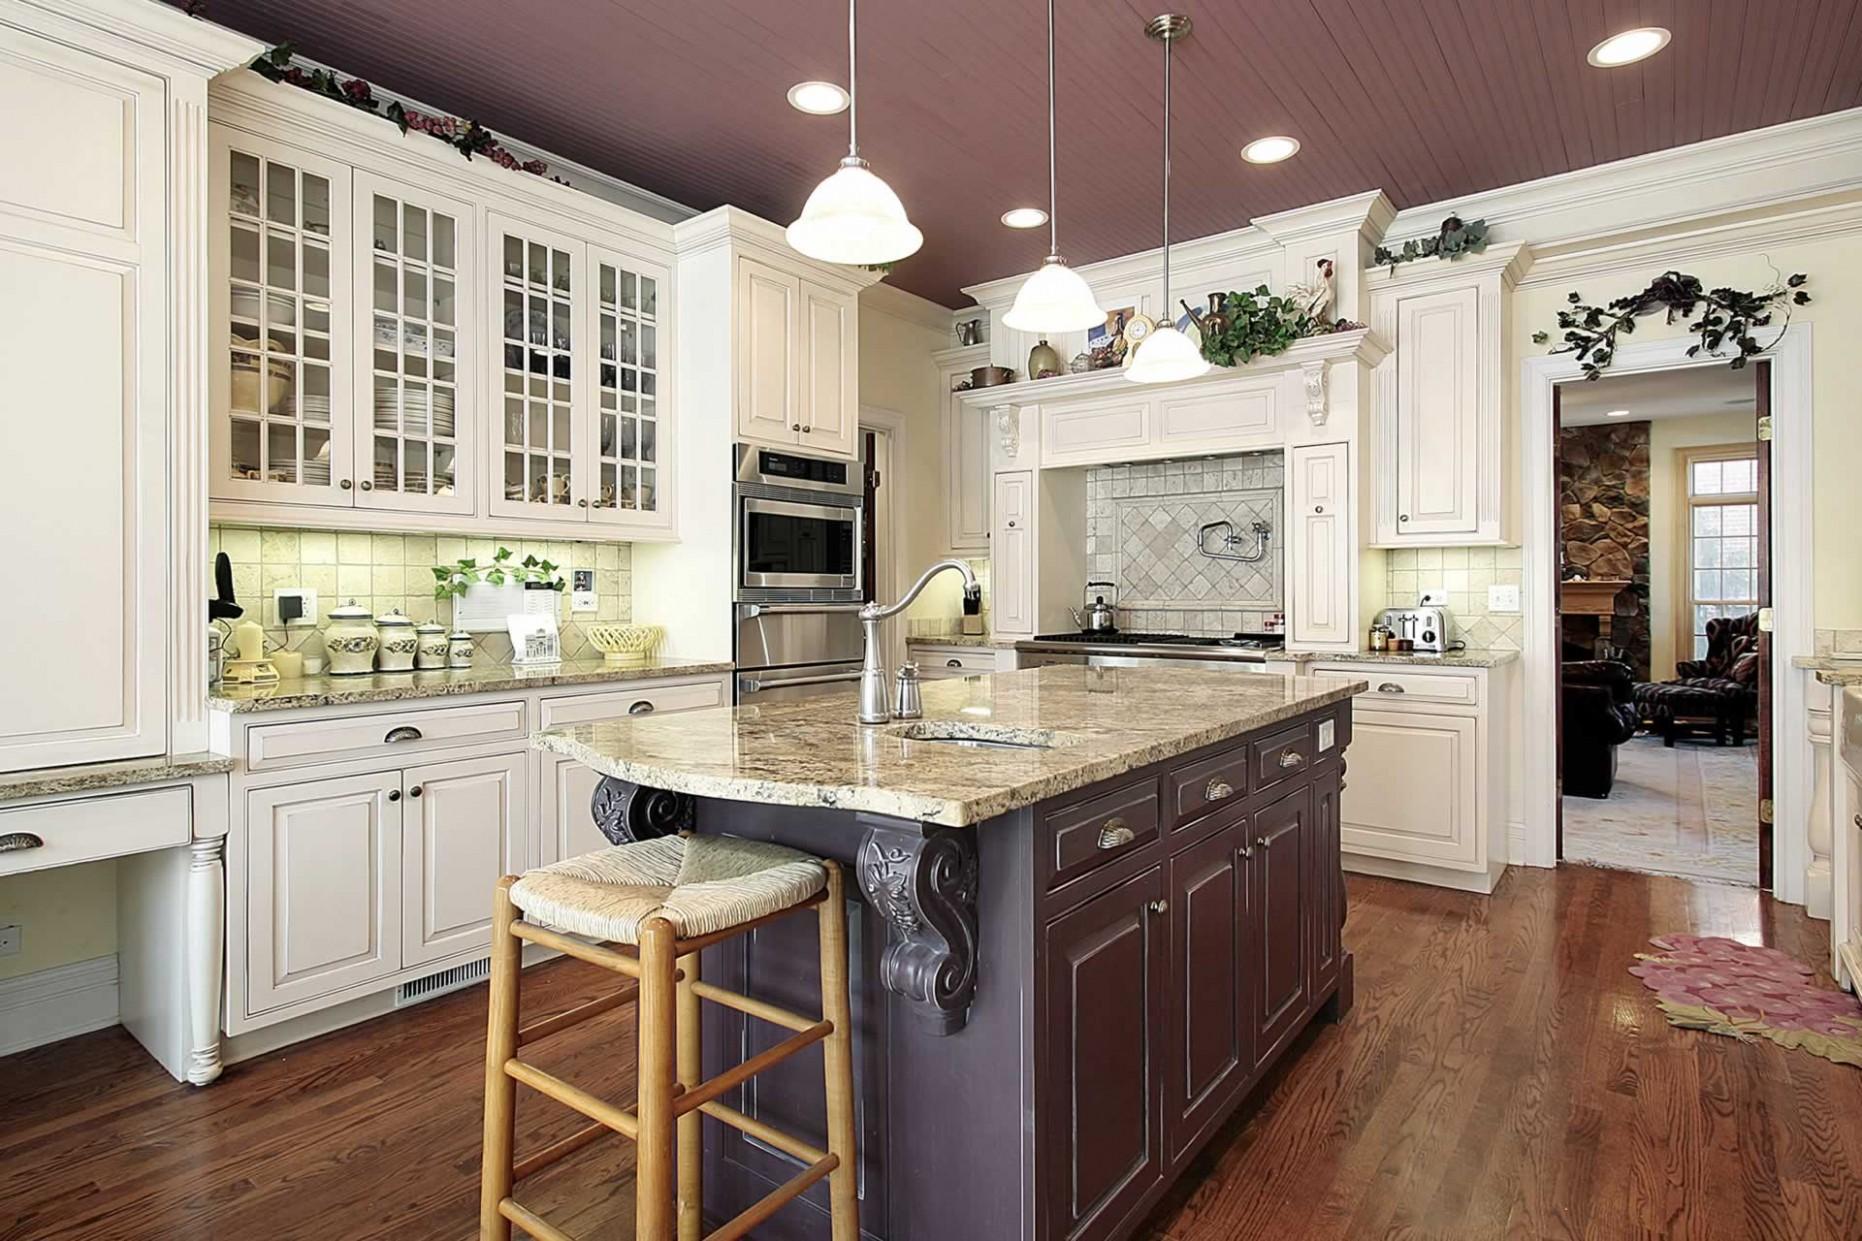 Toronto Kitchen Cabinet Painting & Repainting